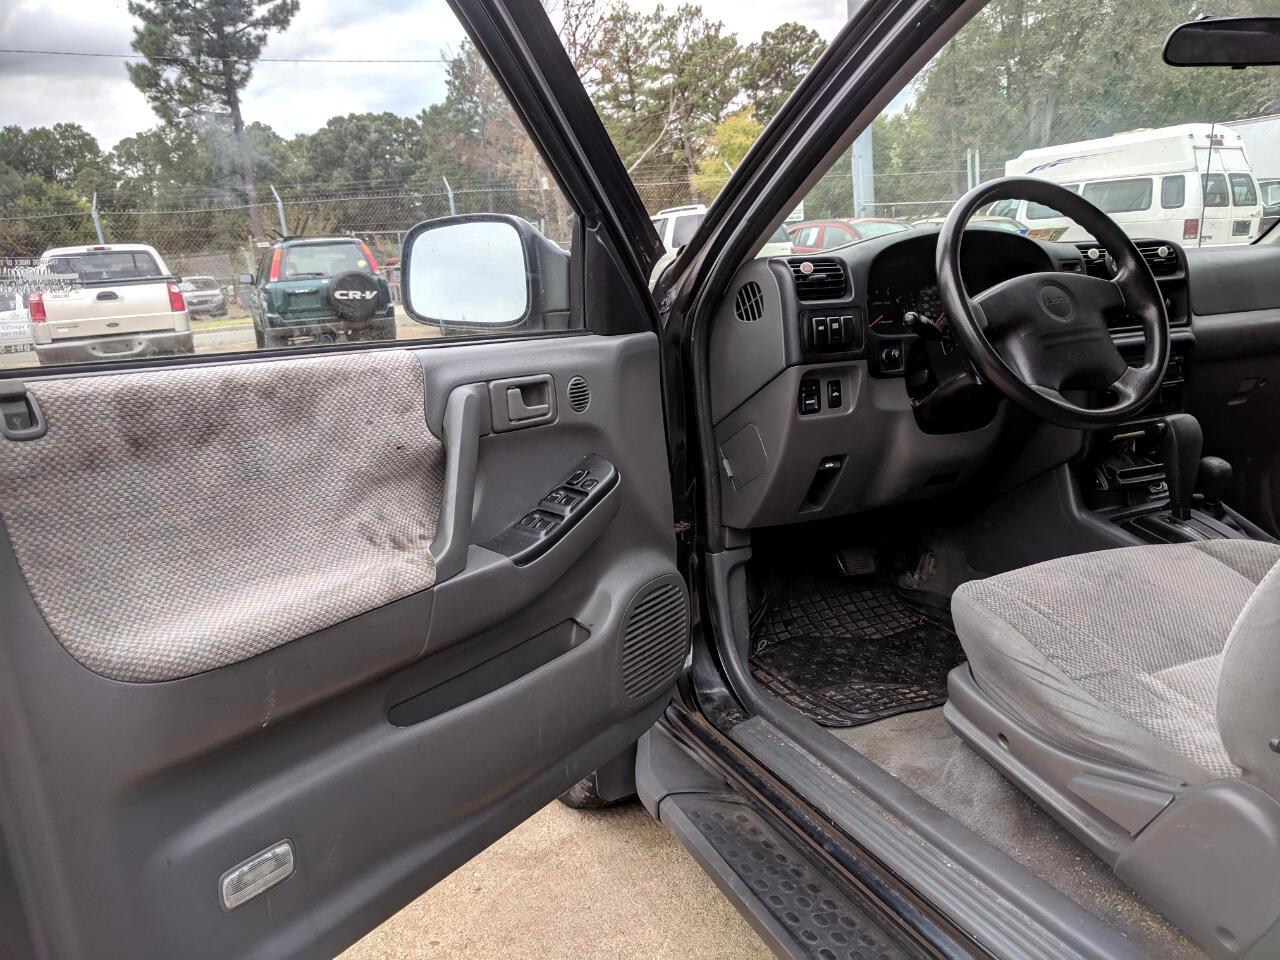 1999 Isuzu Rodeo S 4WD